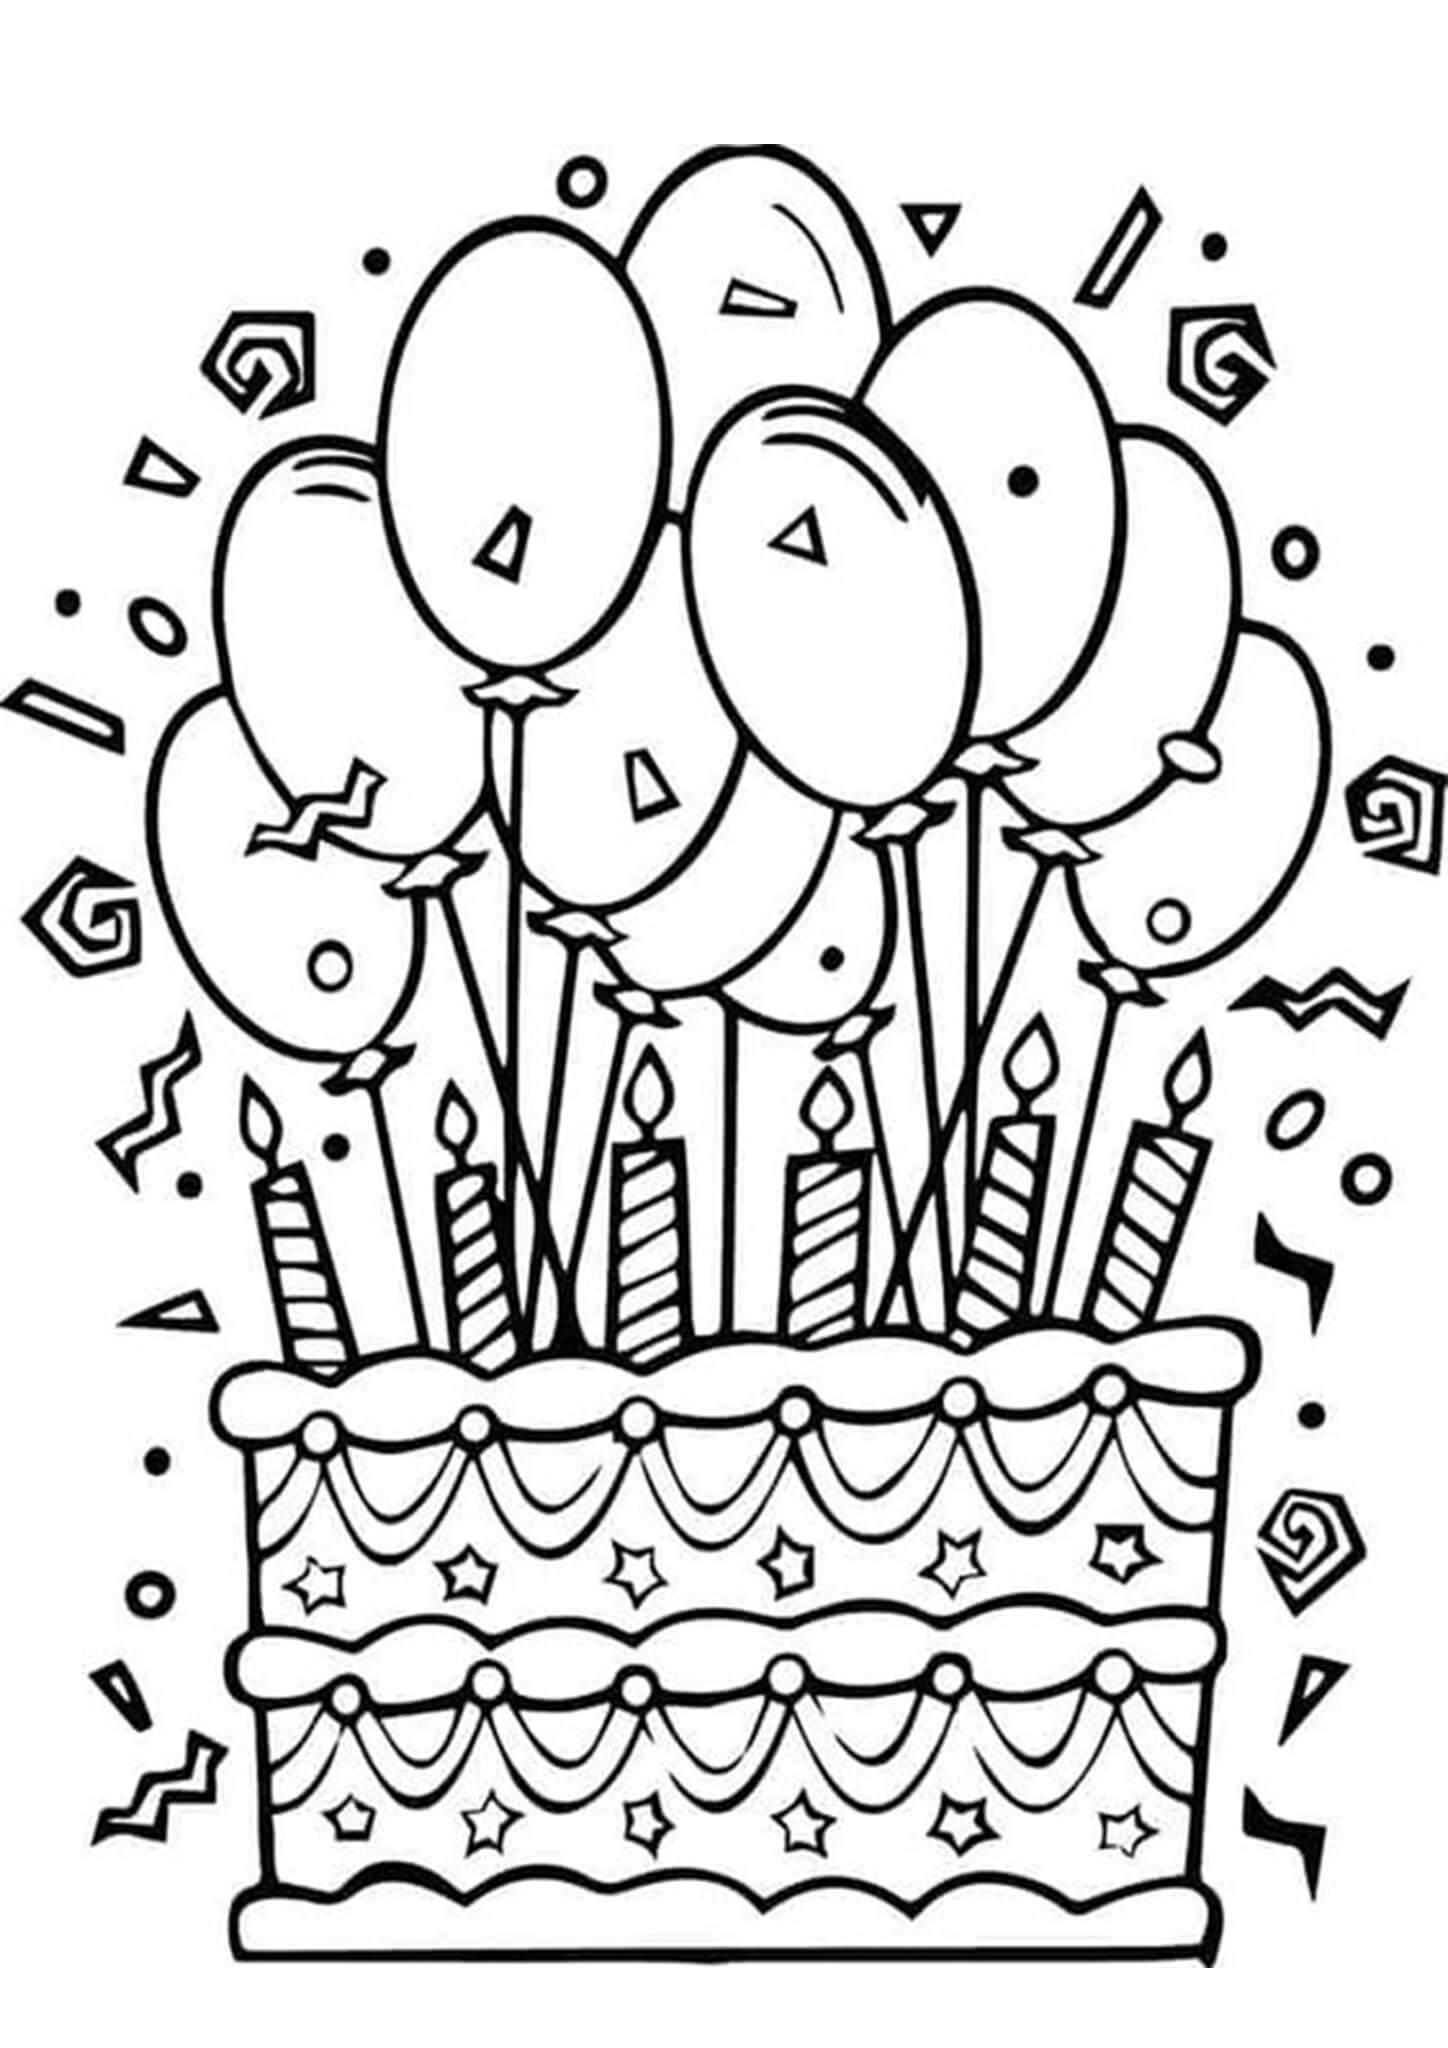 Раскраска Торт ко дня рождения 5